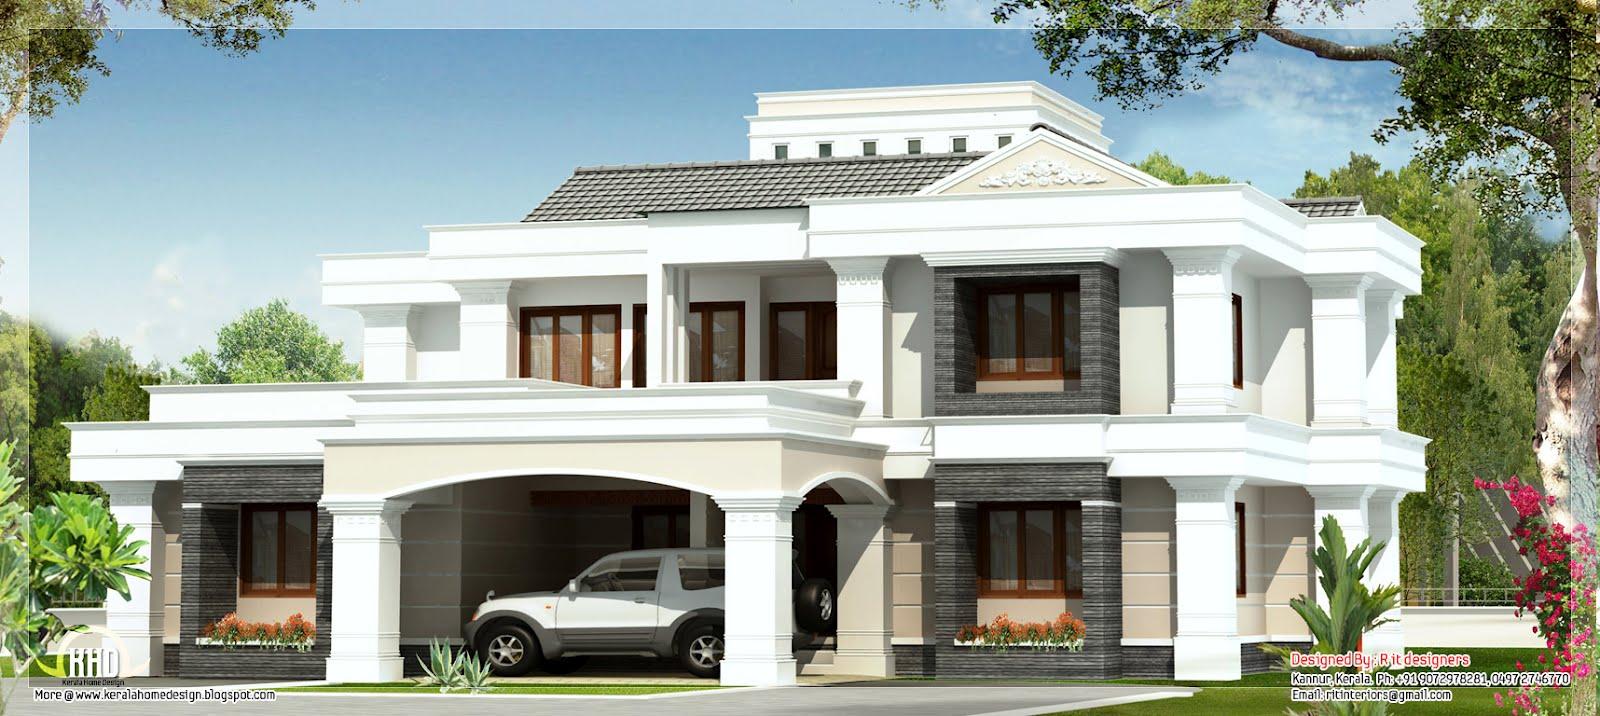 design luxury house double floor 4 bedroom house. Black Bedroom Furniture Sets. Home Design Ideas